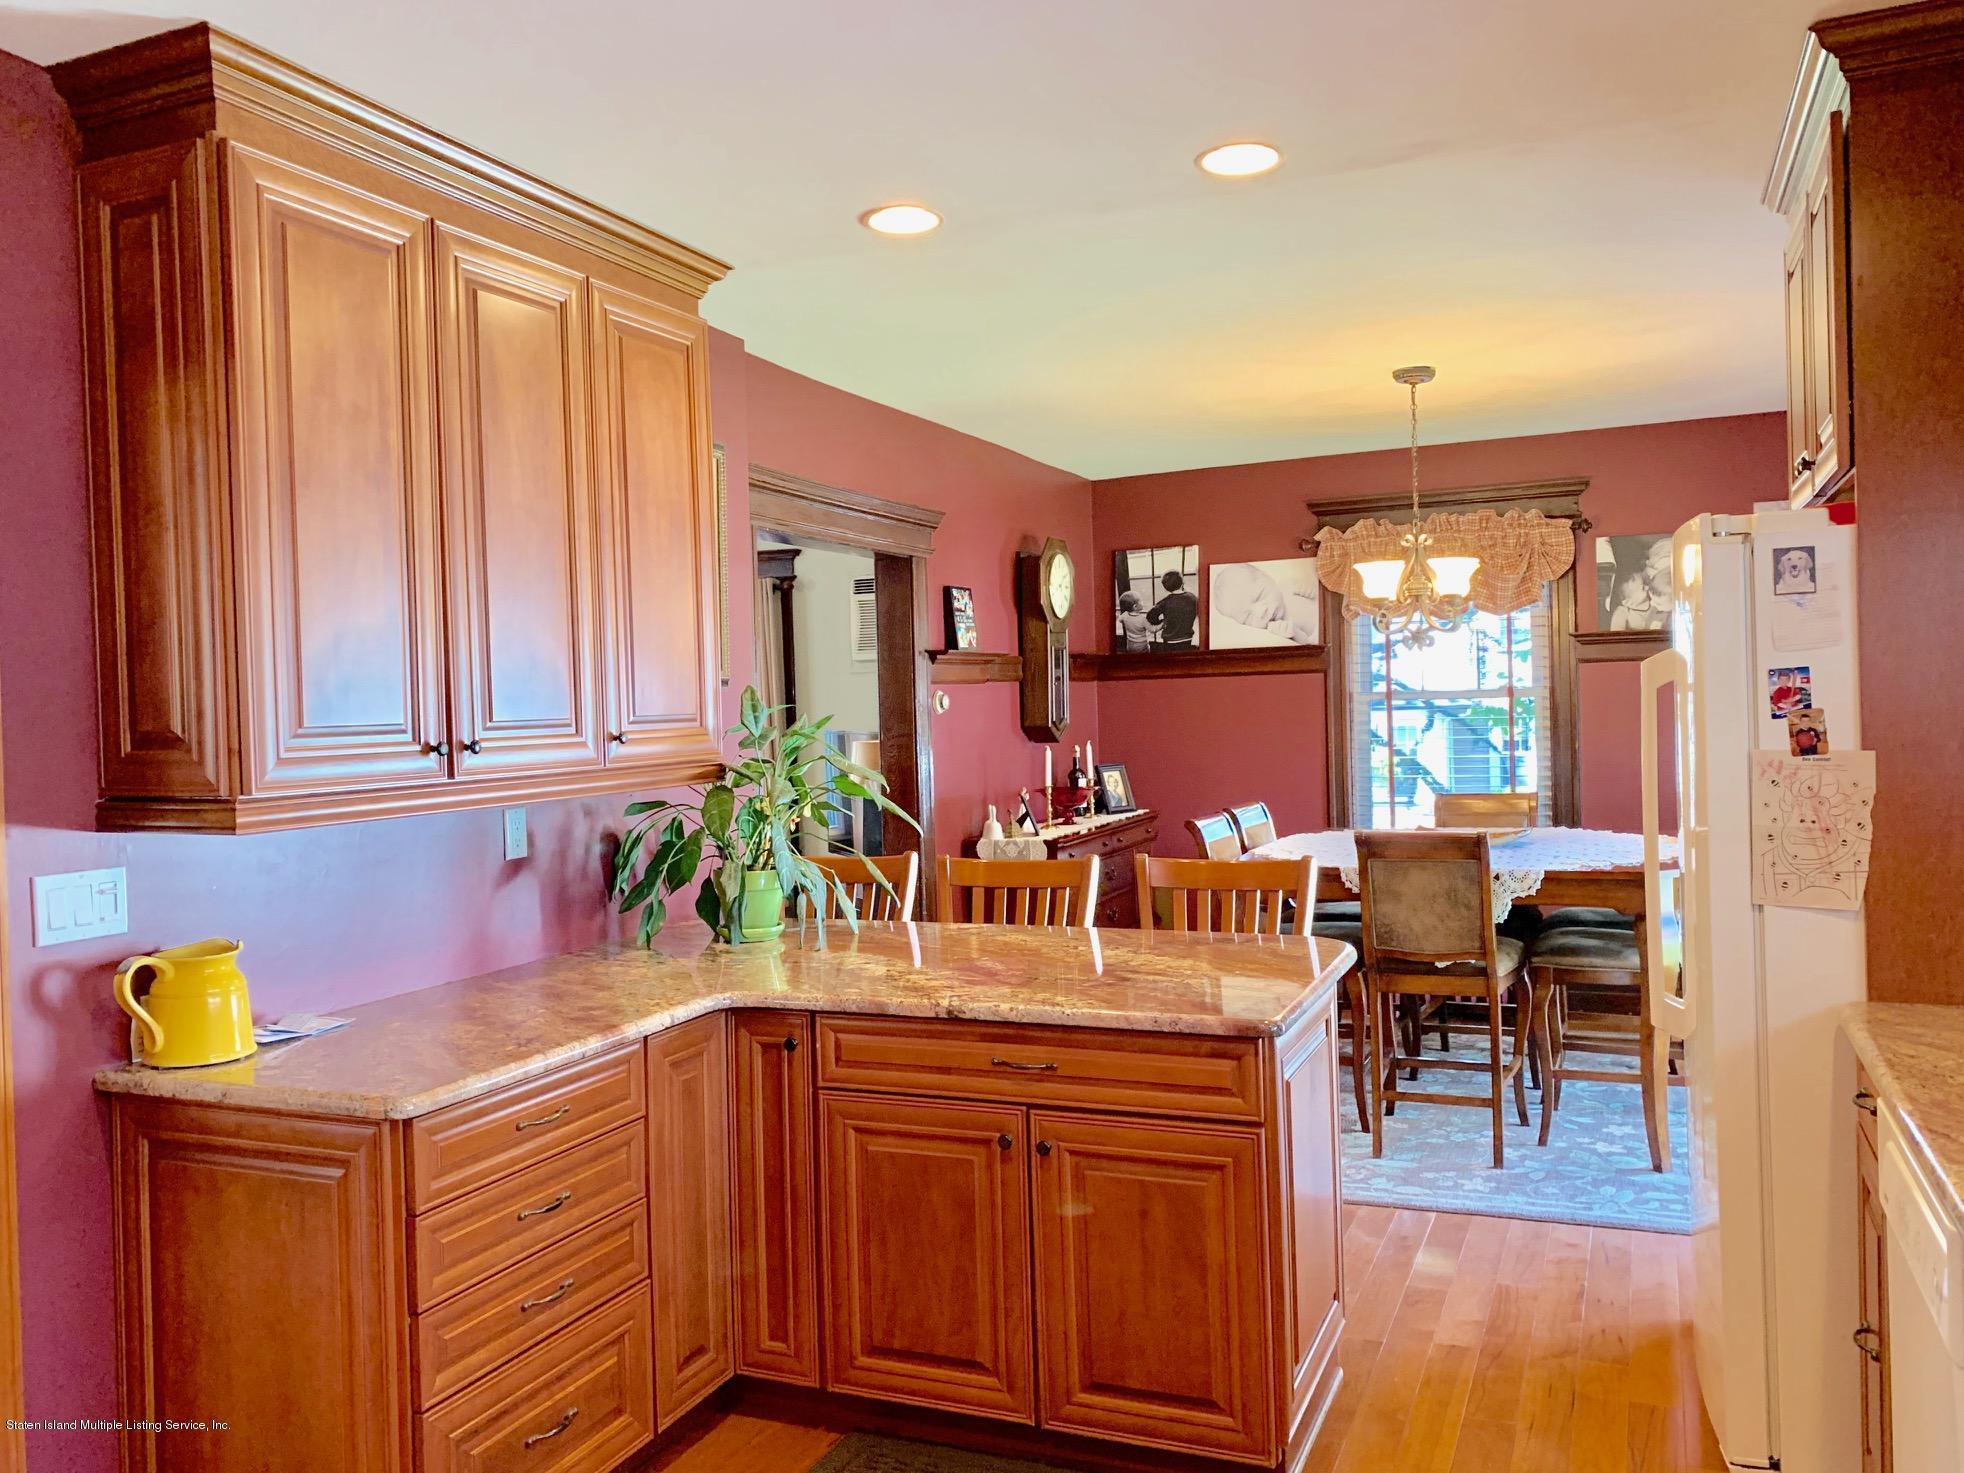 Single Family - Detached 195 Fairview Avenue  Staten Island, NY 10314, MLS-1132423-15